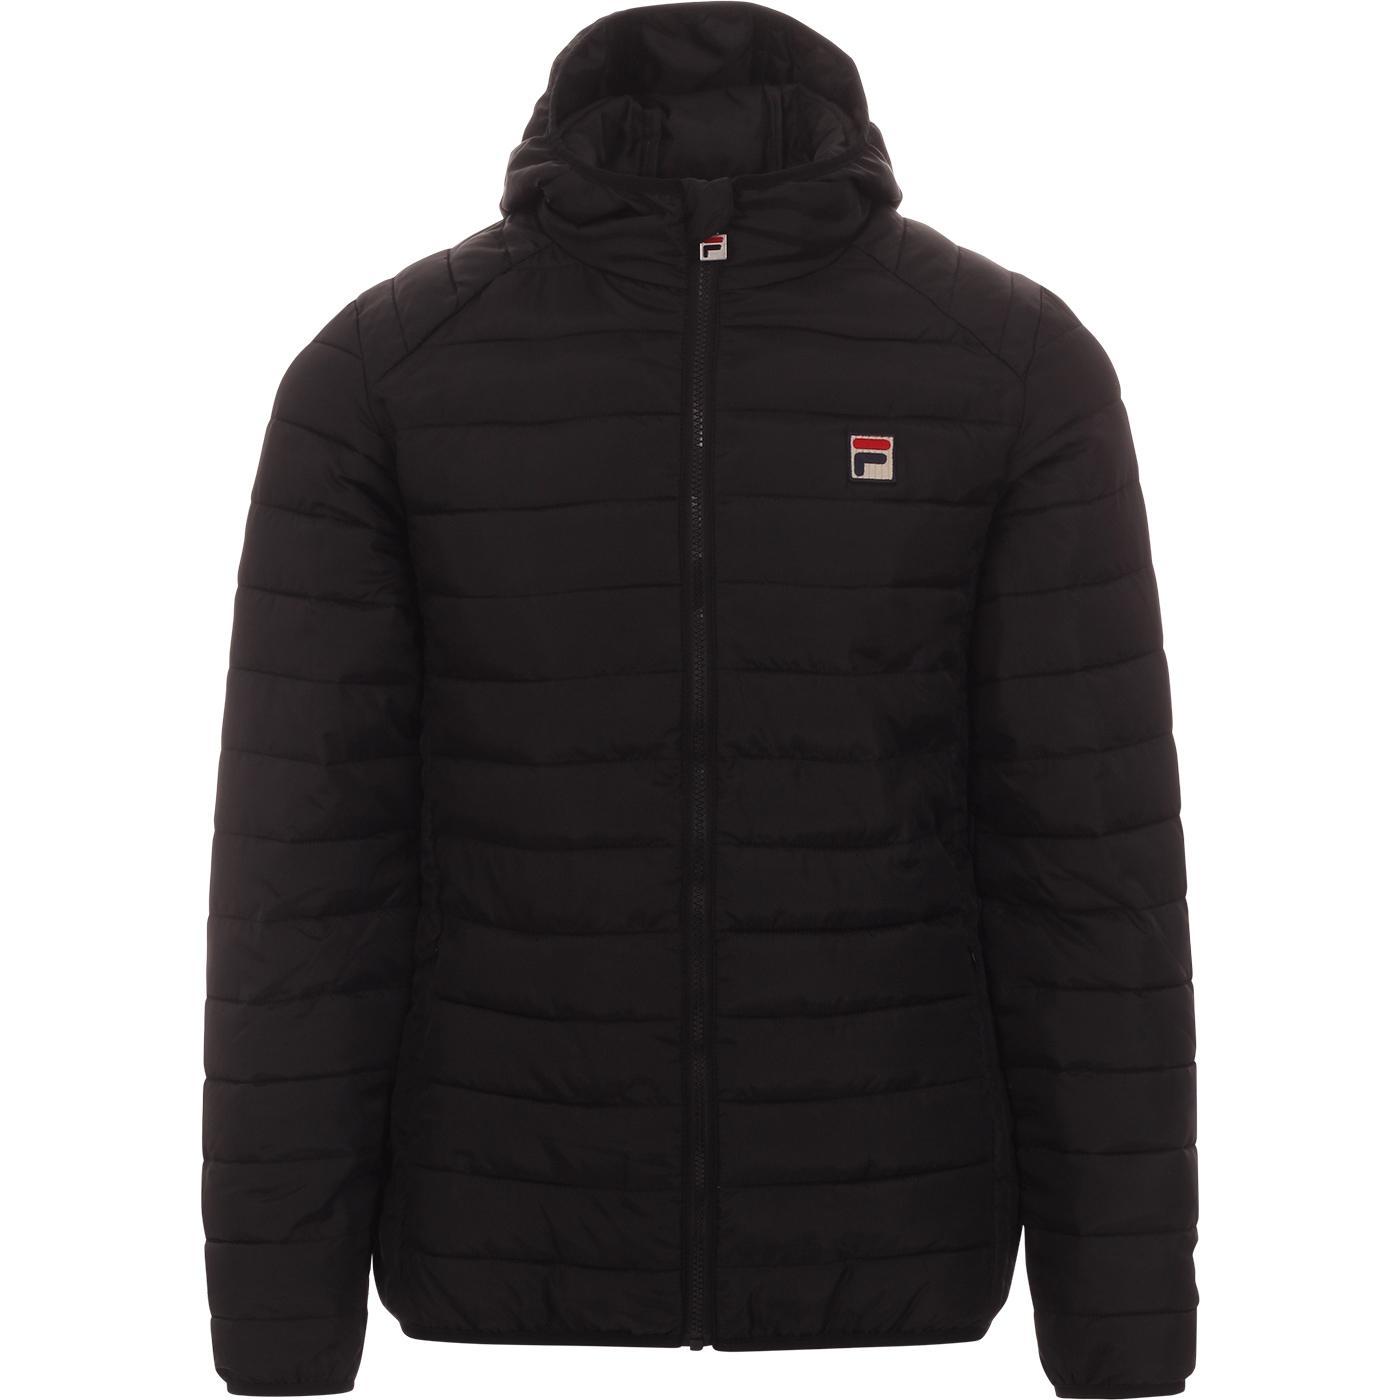 Pavo FILA VINTAGE Retro Quilted Ski Jacket (Black)